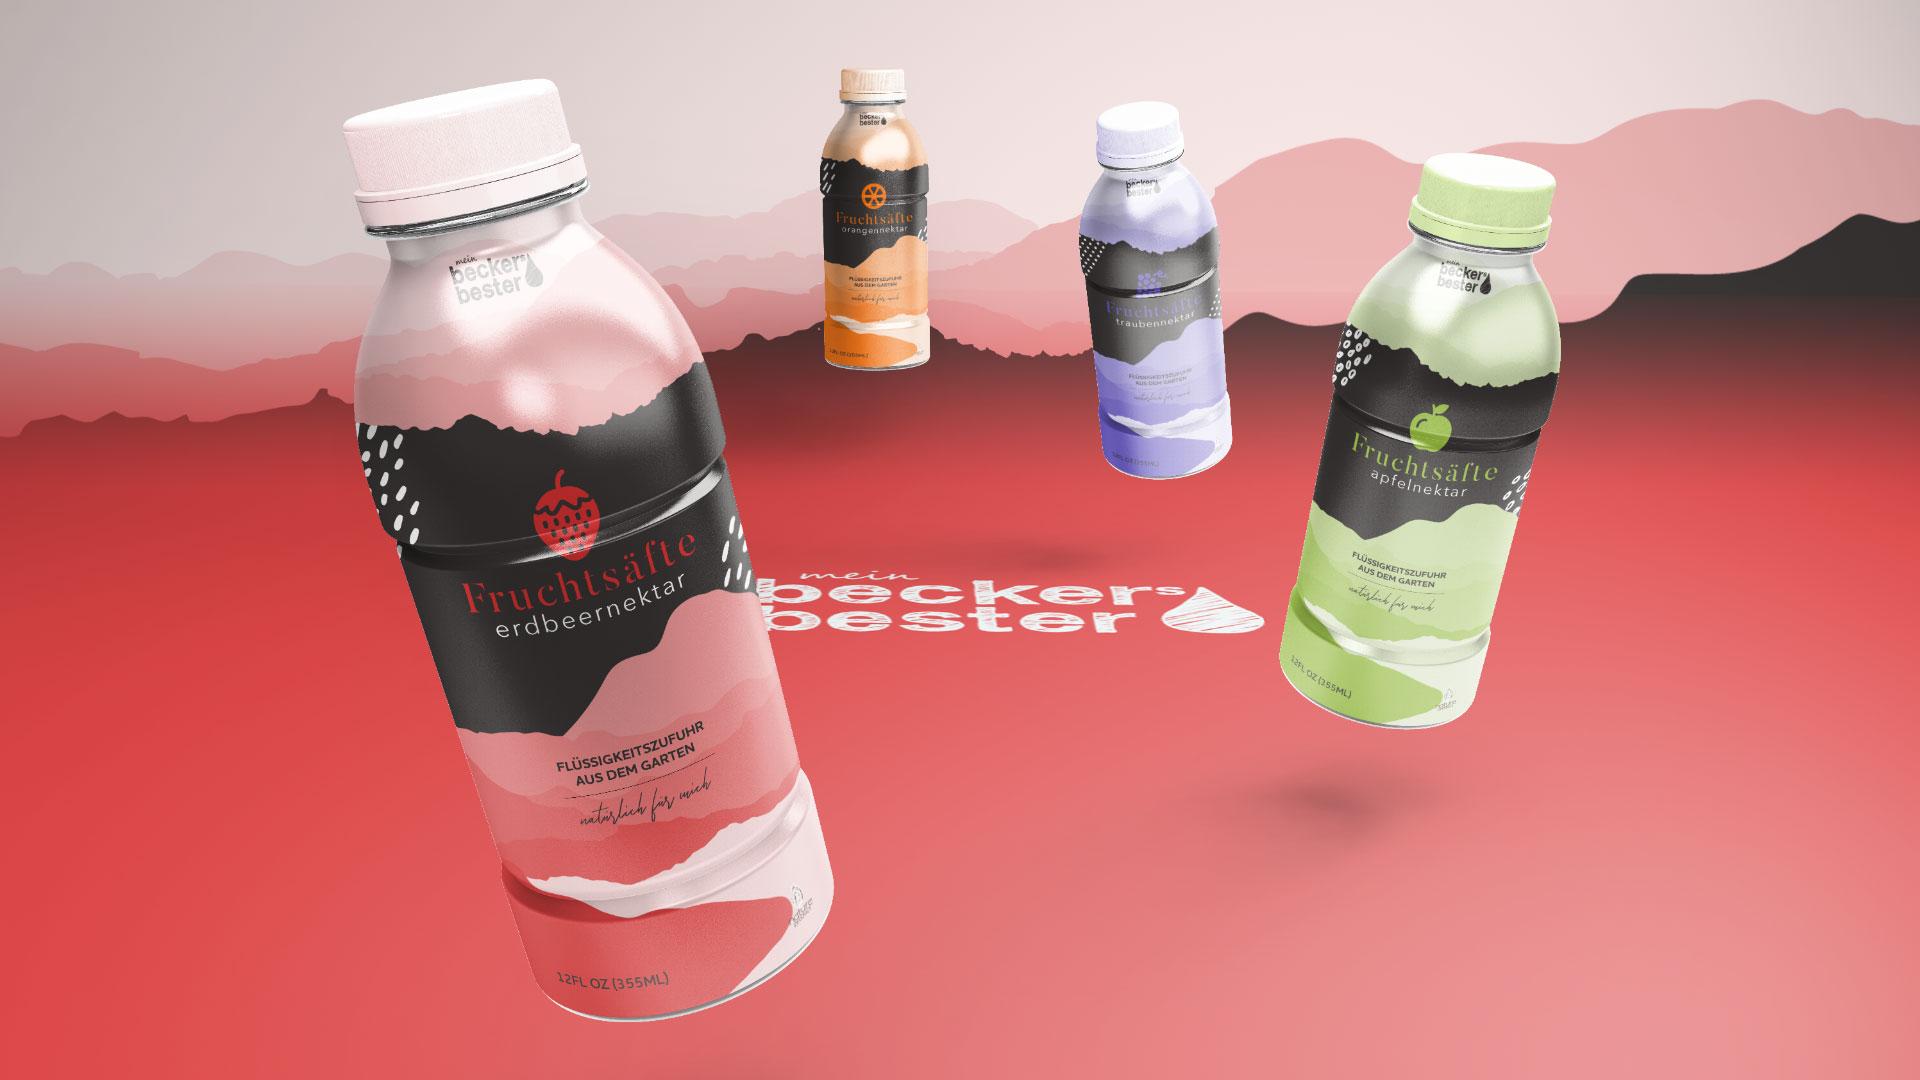 Vinille Create Packaging for Becker's Bester, German Fruit Juice Manufacturer